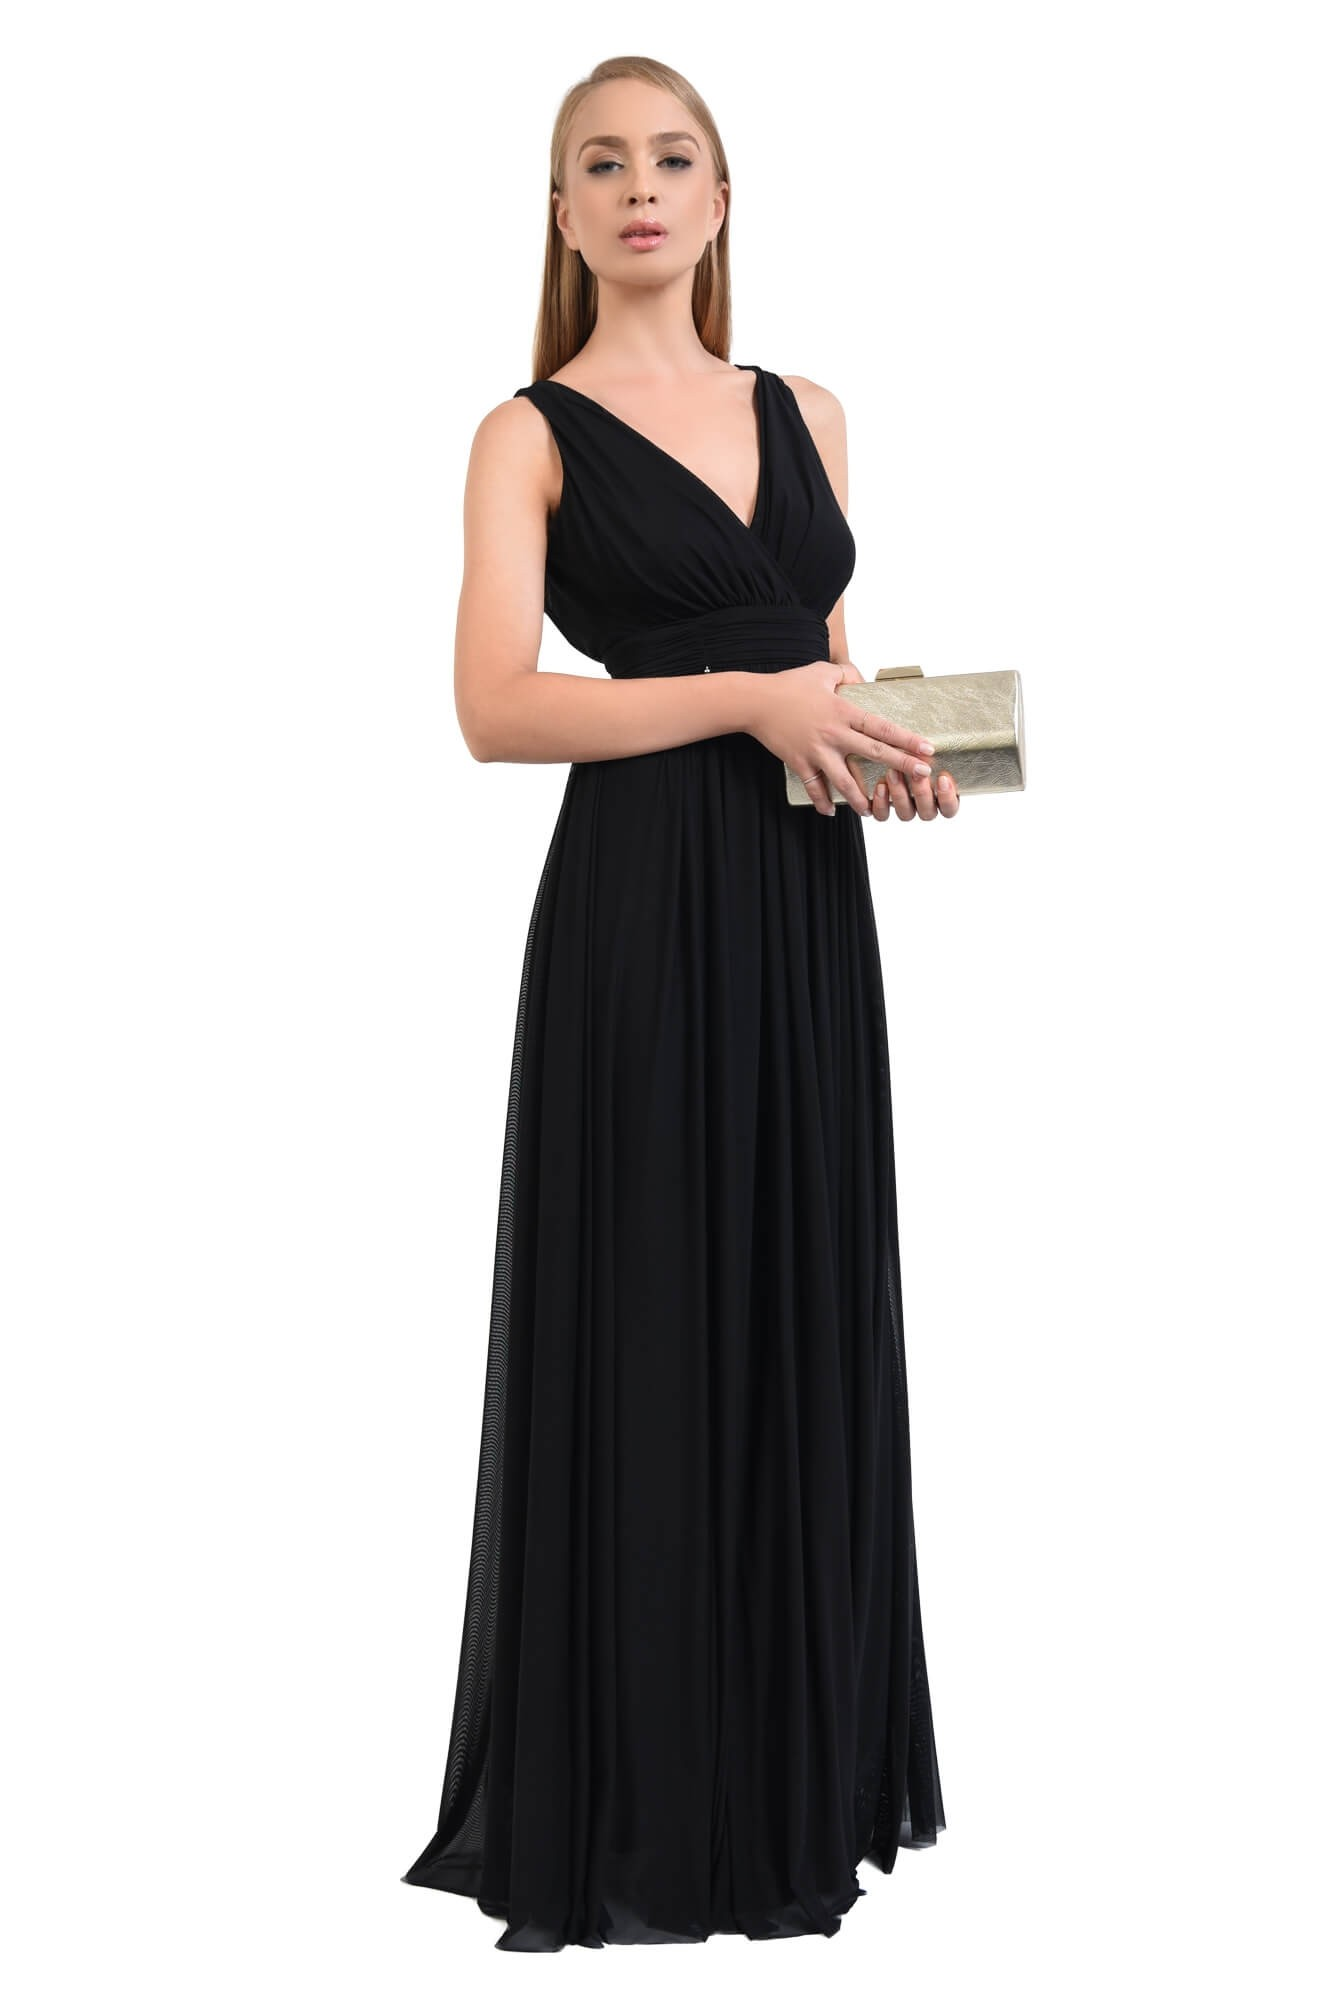 rochie eleganta, lunga, tul, negru, decolteu, anchior